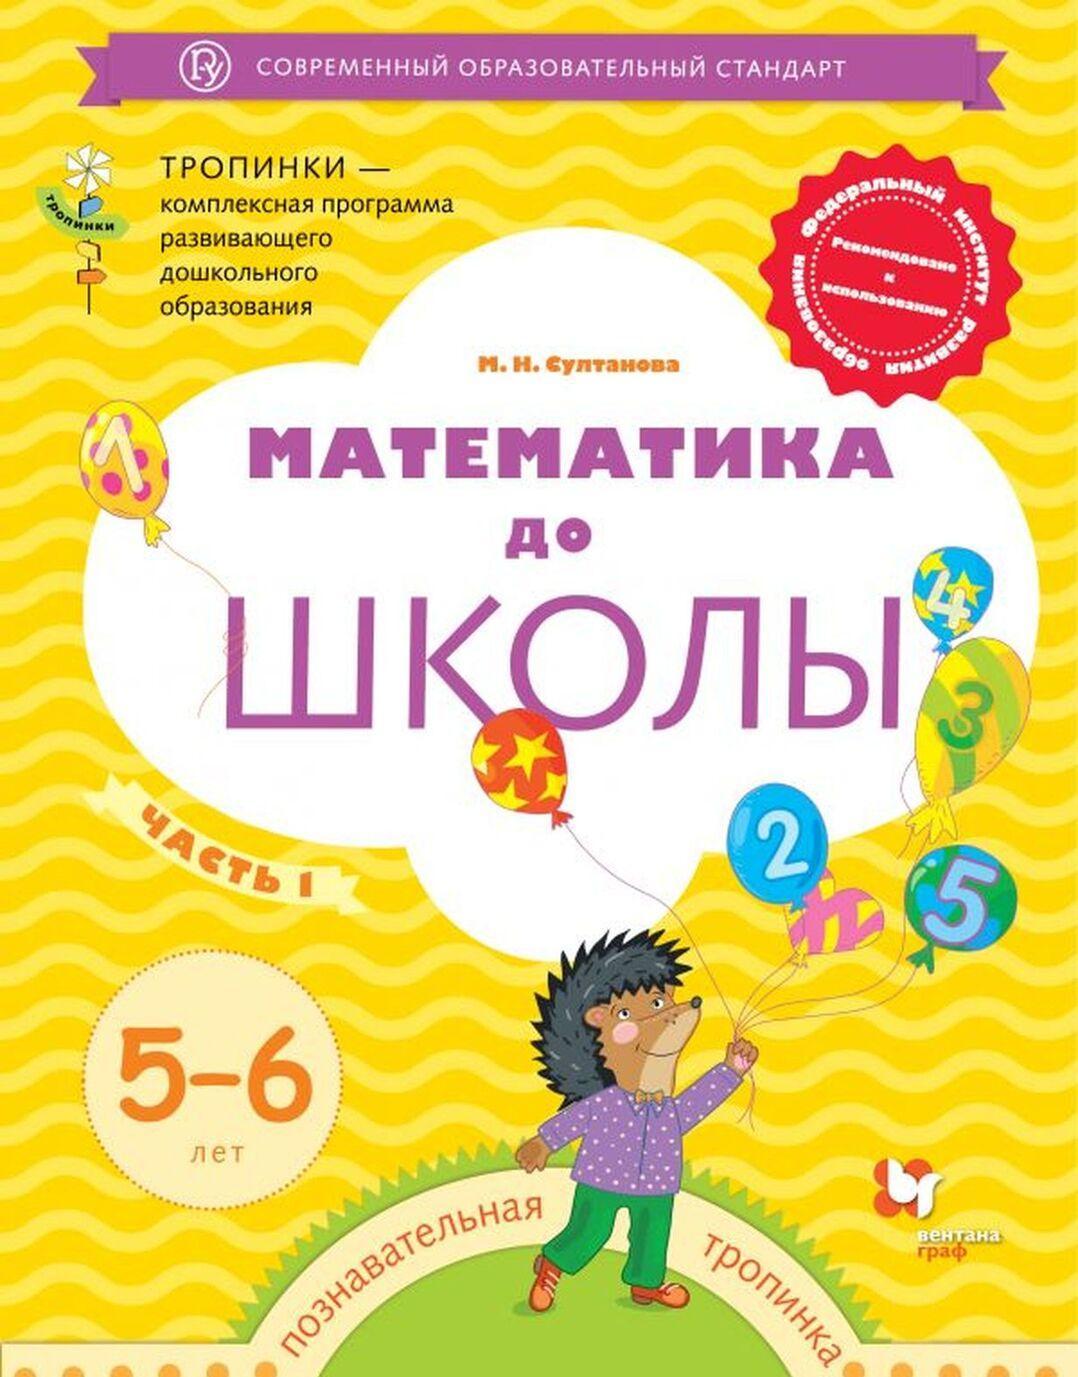 Matematika do shkoly. Rabochaja tetrad. V 2-kh chastjakh. Chast 1 | Sultanova Marina Naumovna